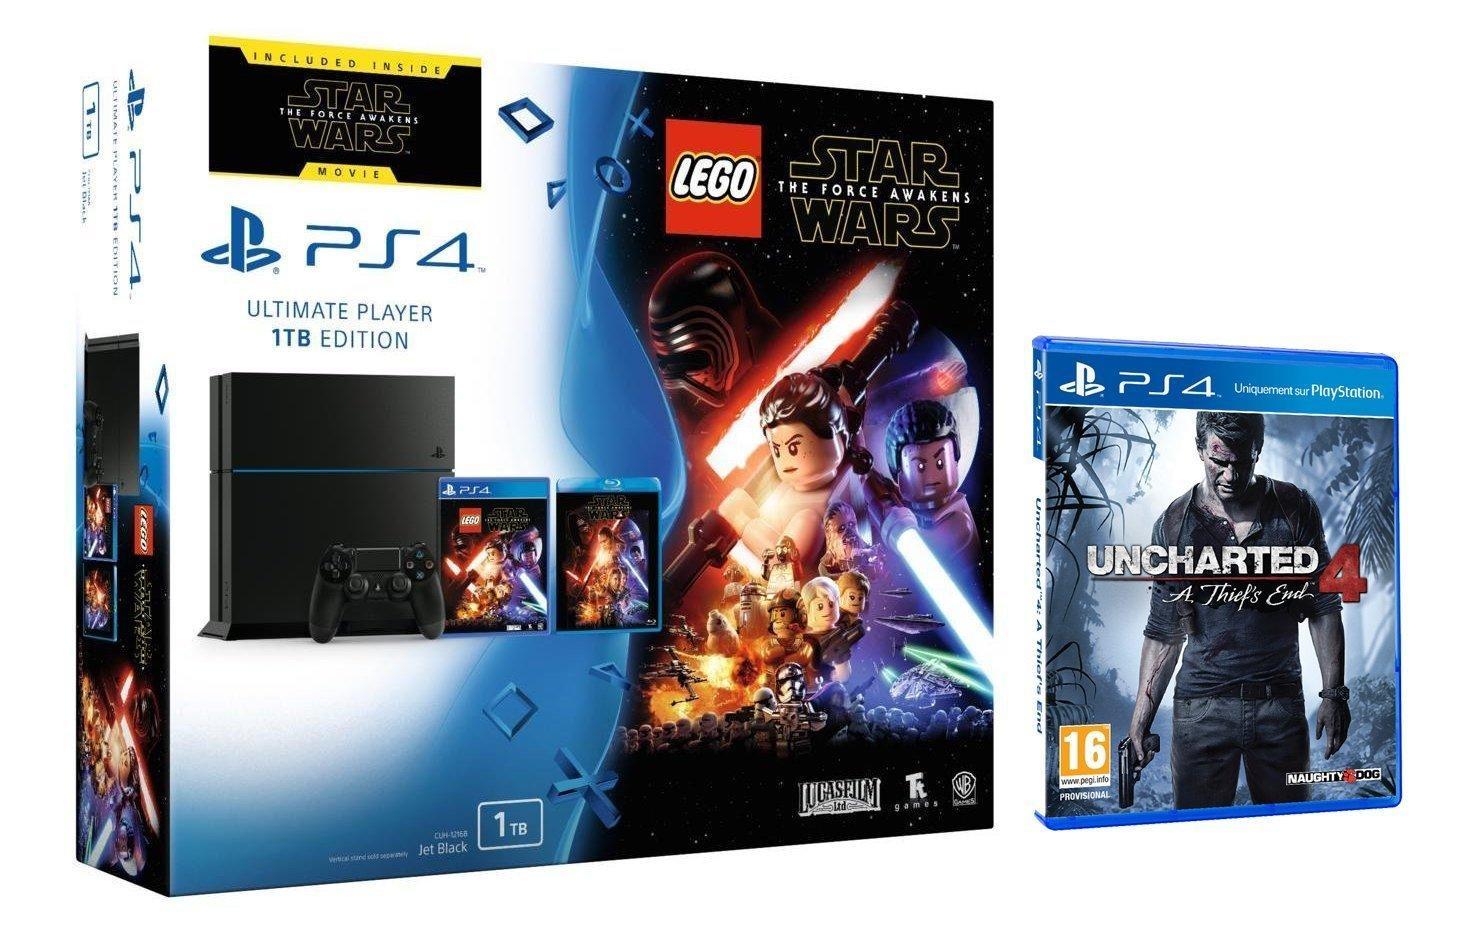 Console Sony PS4 1 To + Lego Star Wars: Le Réveil de la Force + Blu-ray Star Wars + GTA V + Uncharted 4